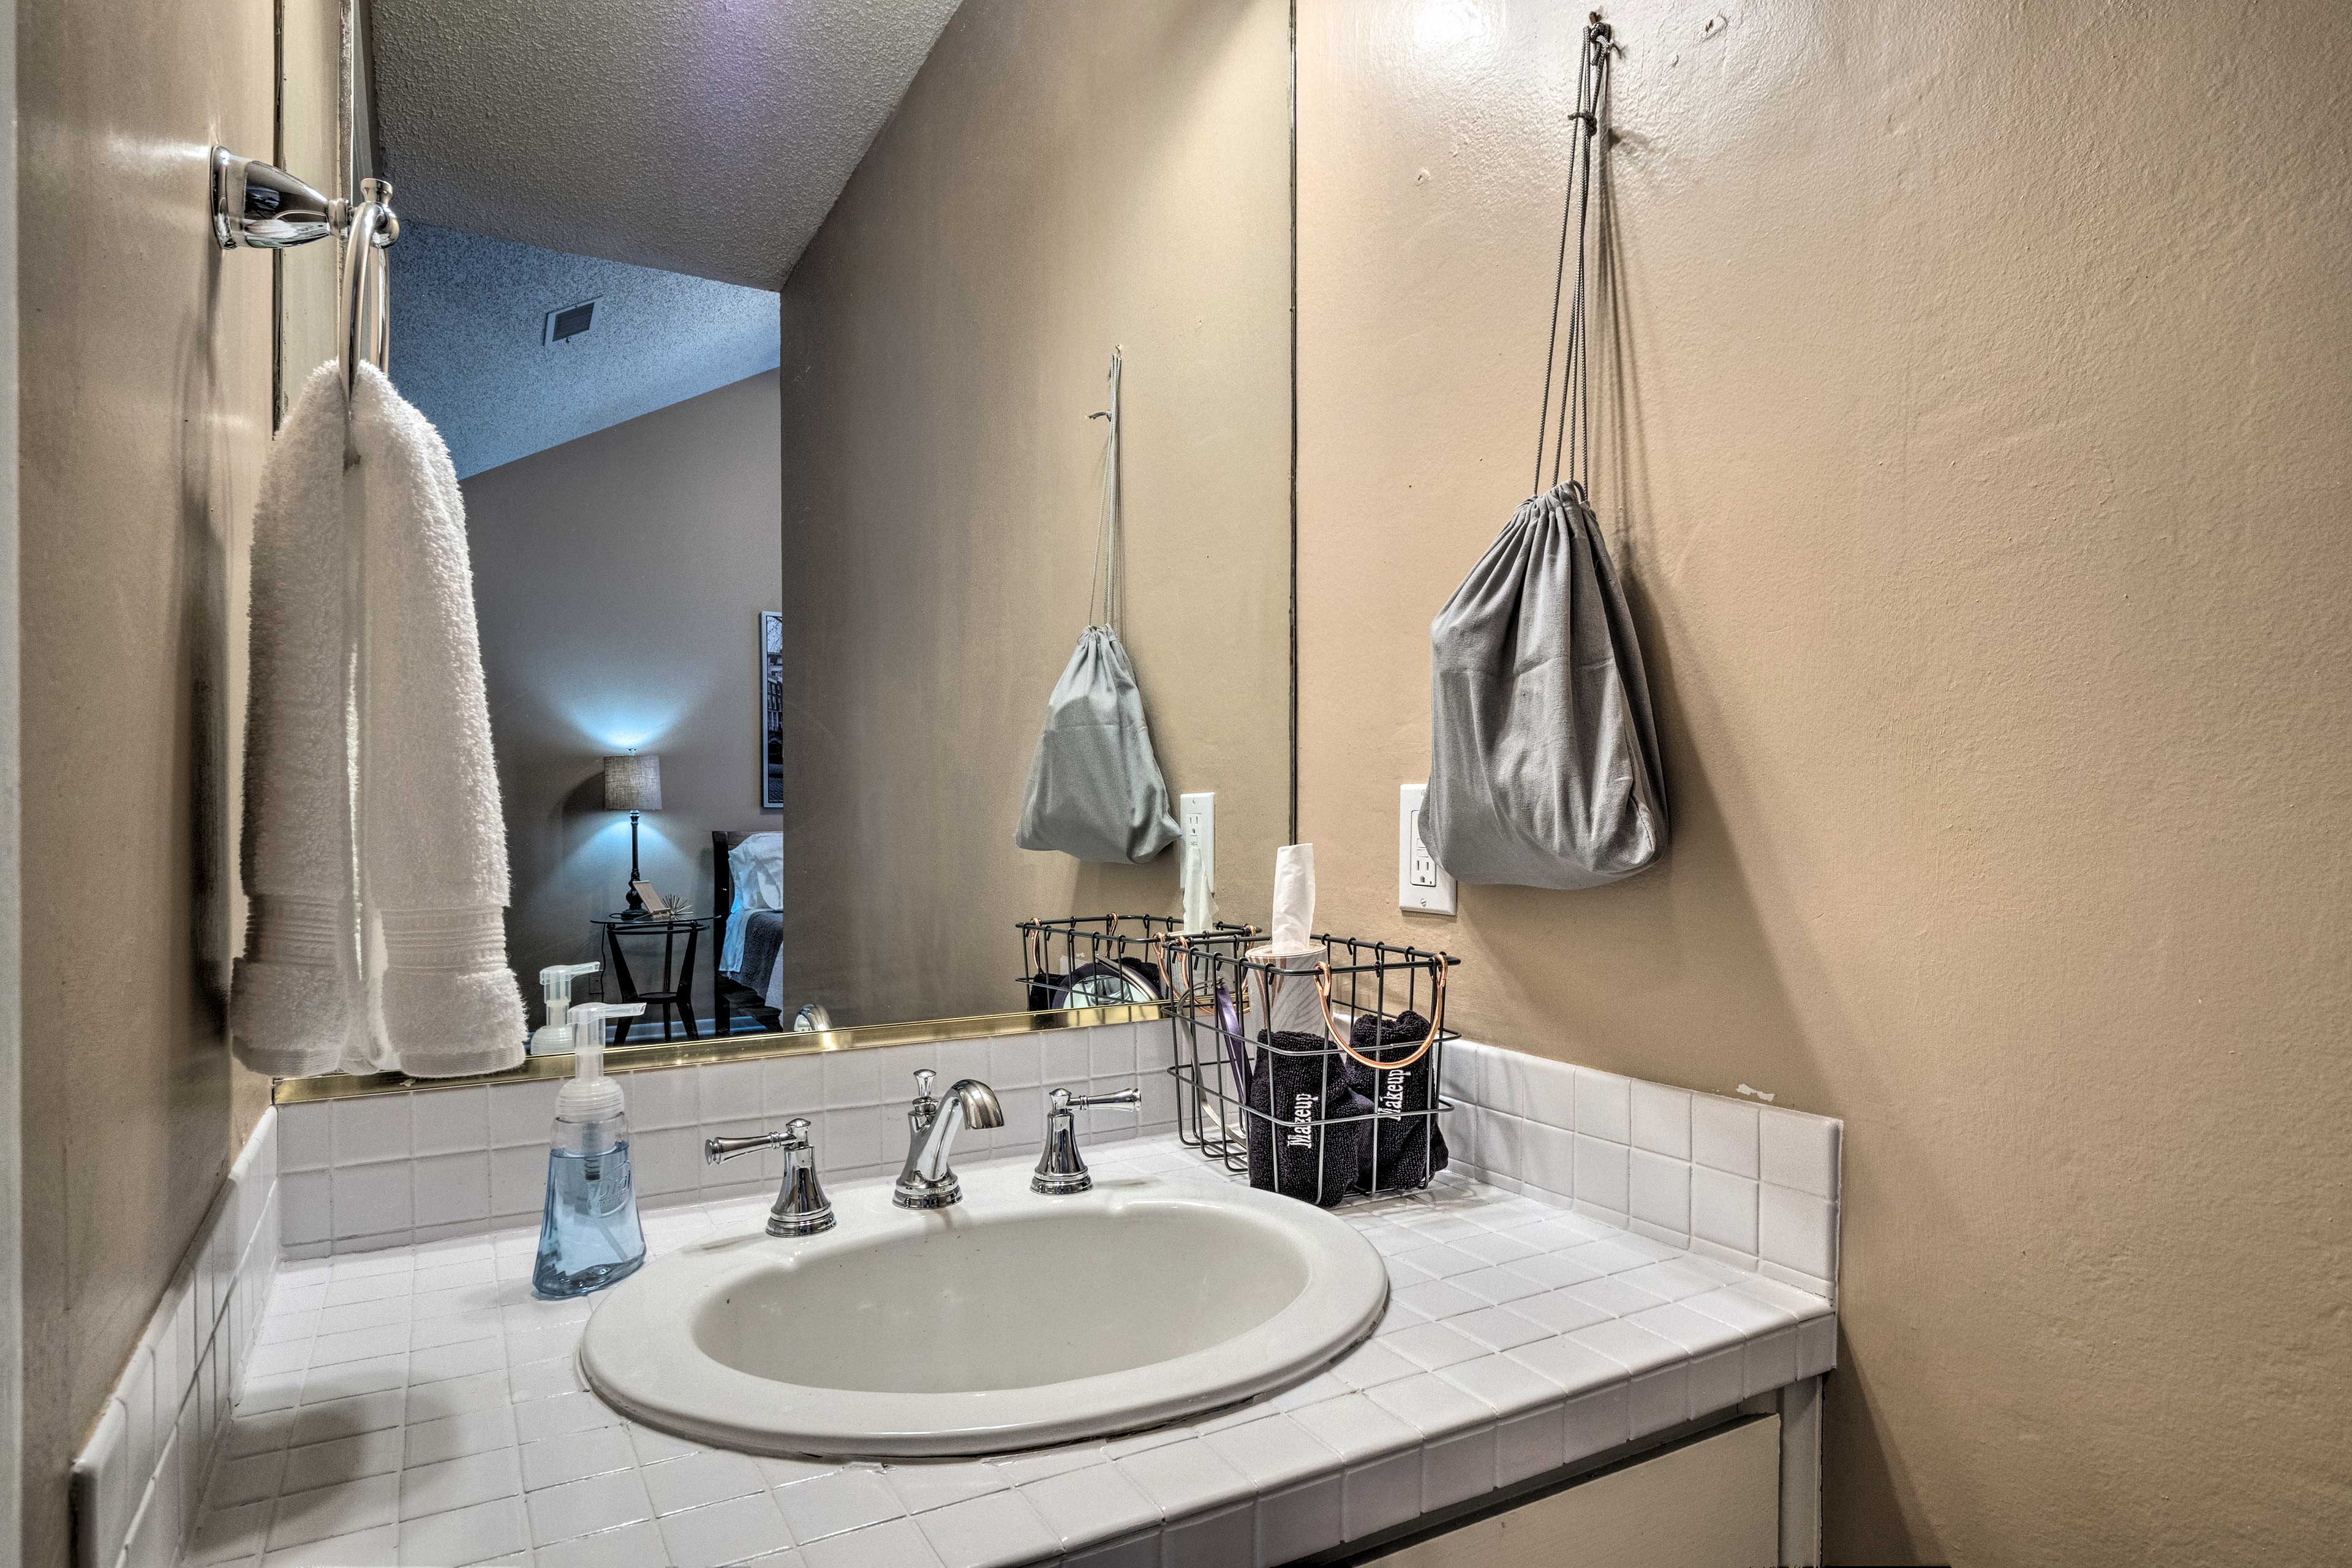 Wash up in the en-suite bathroom.